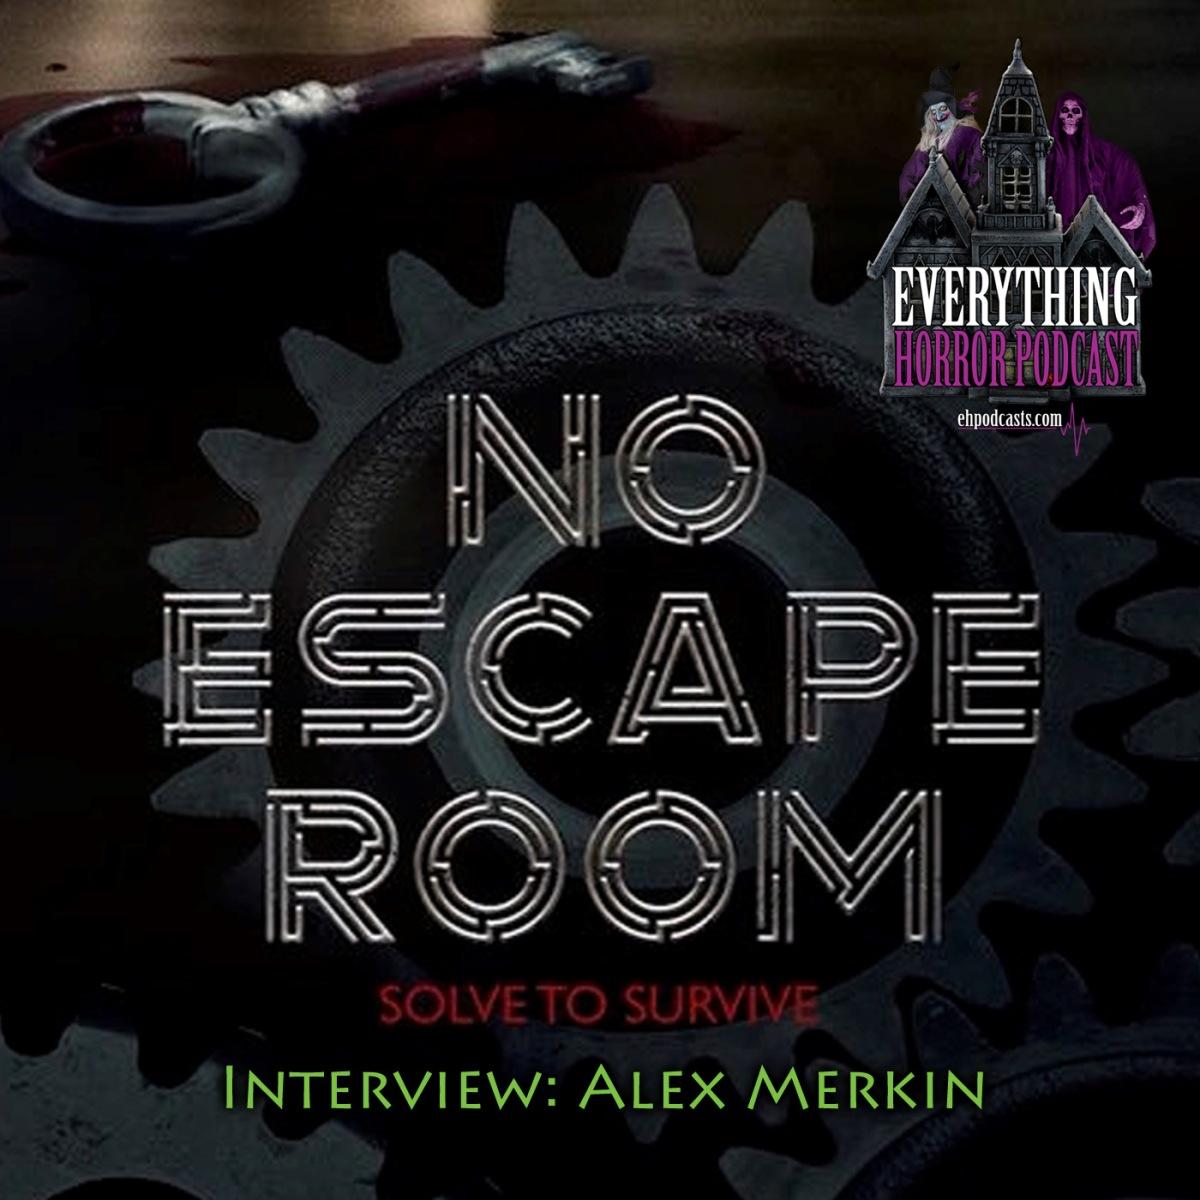 Interview: Alex Merkin / Director